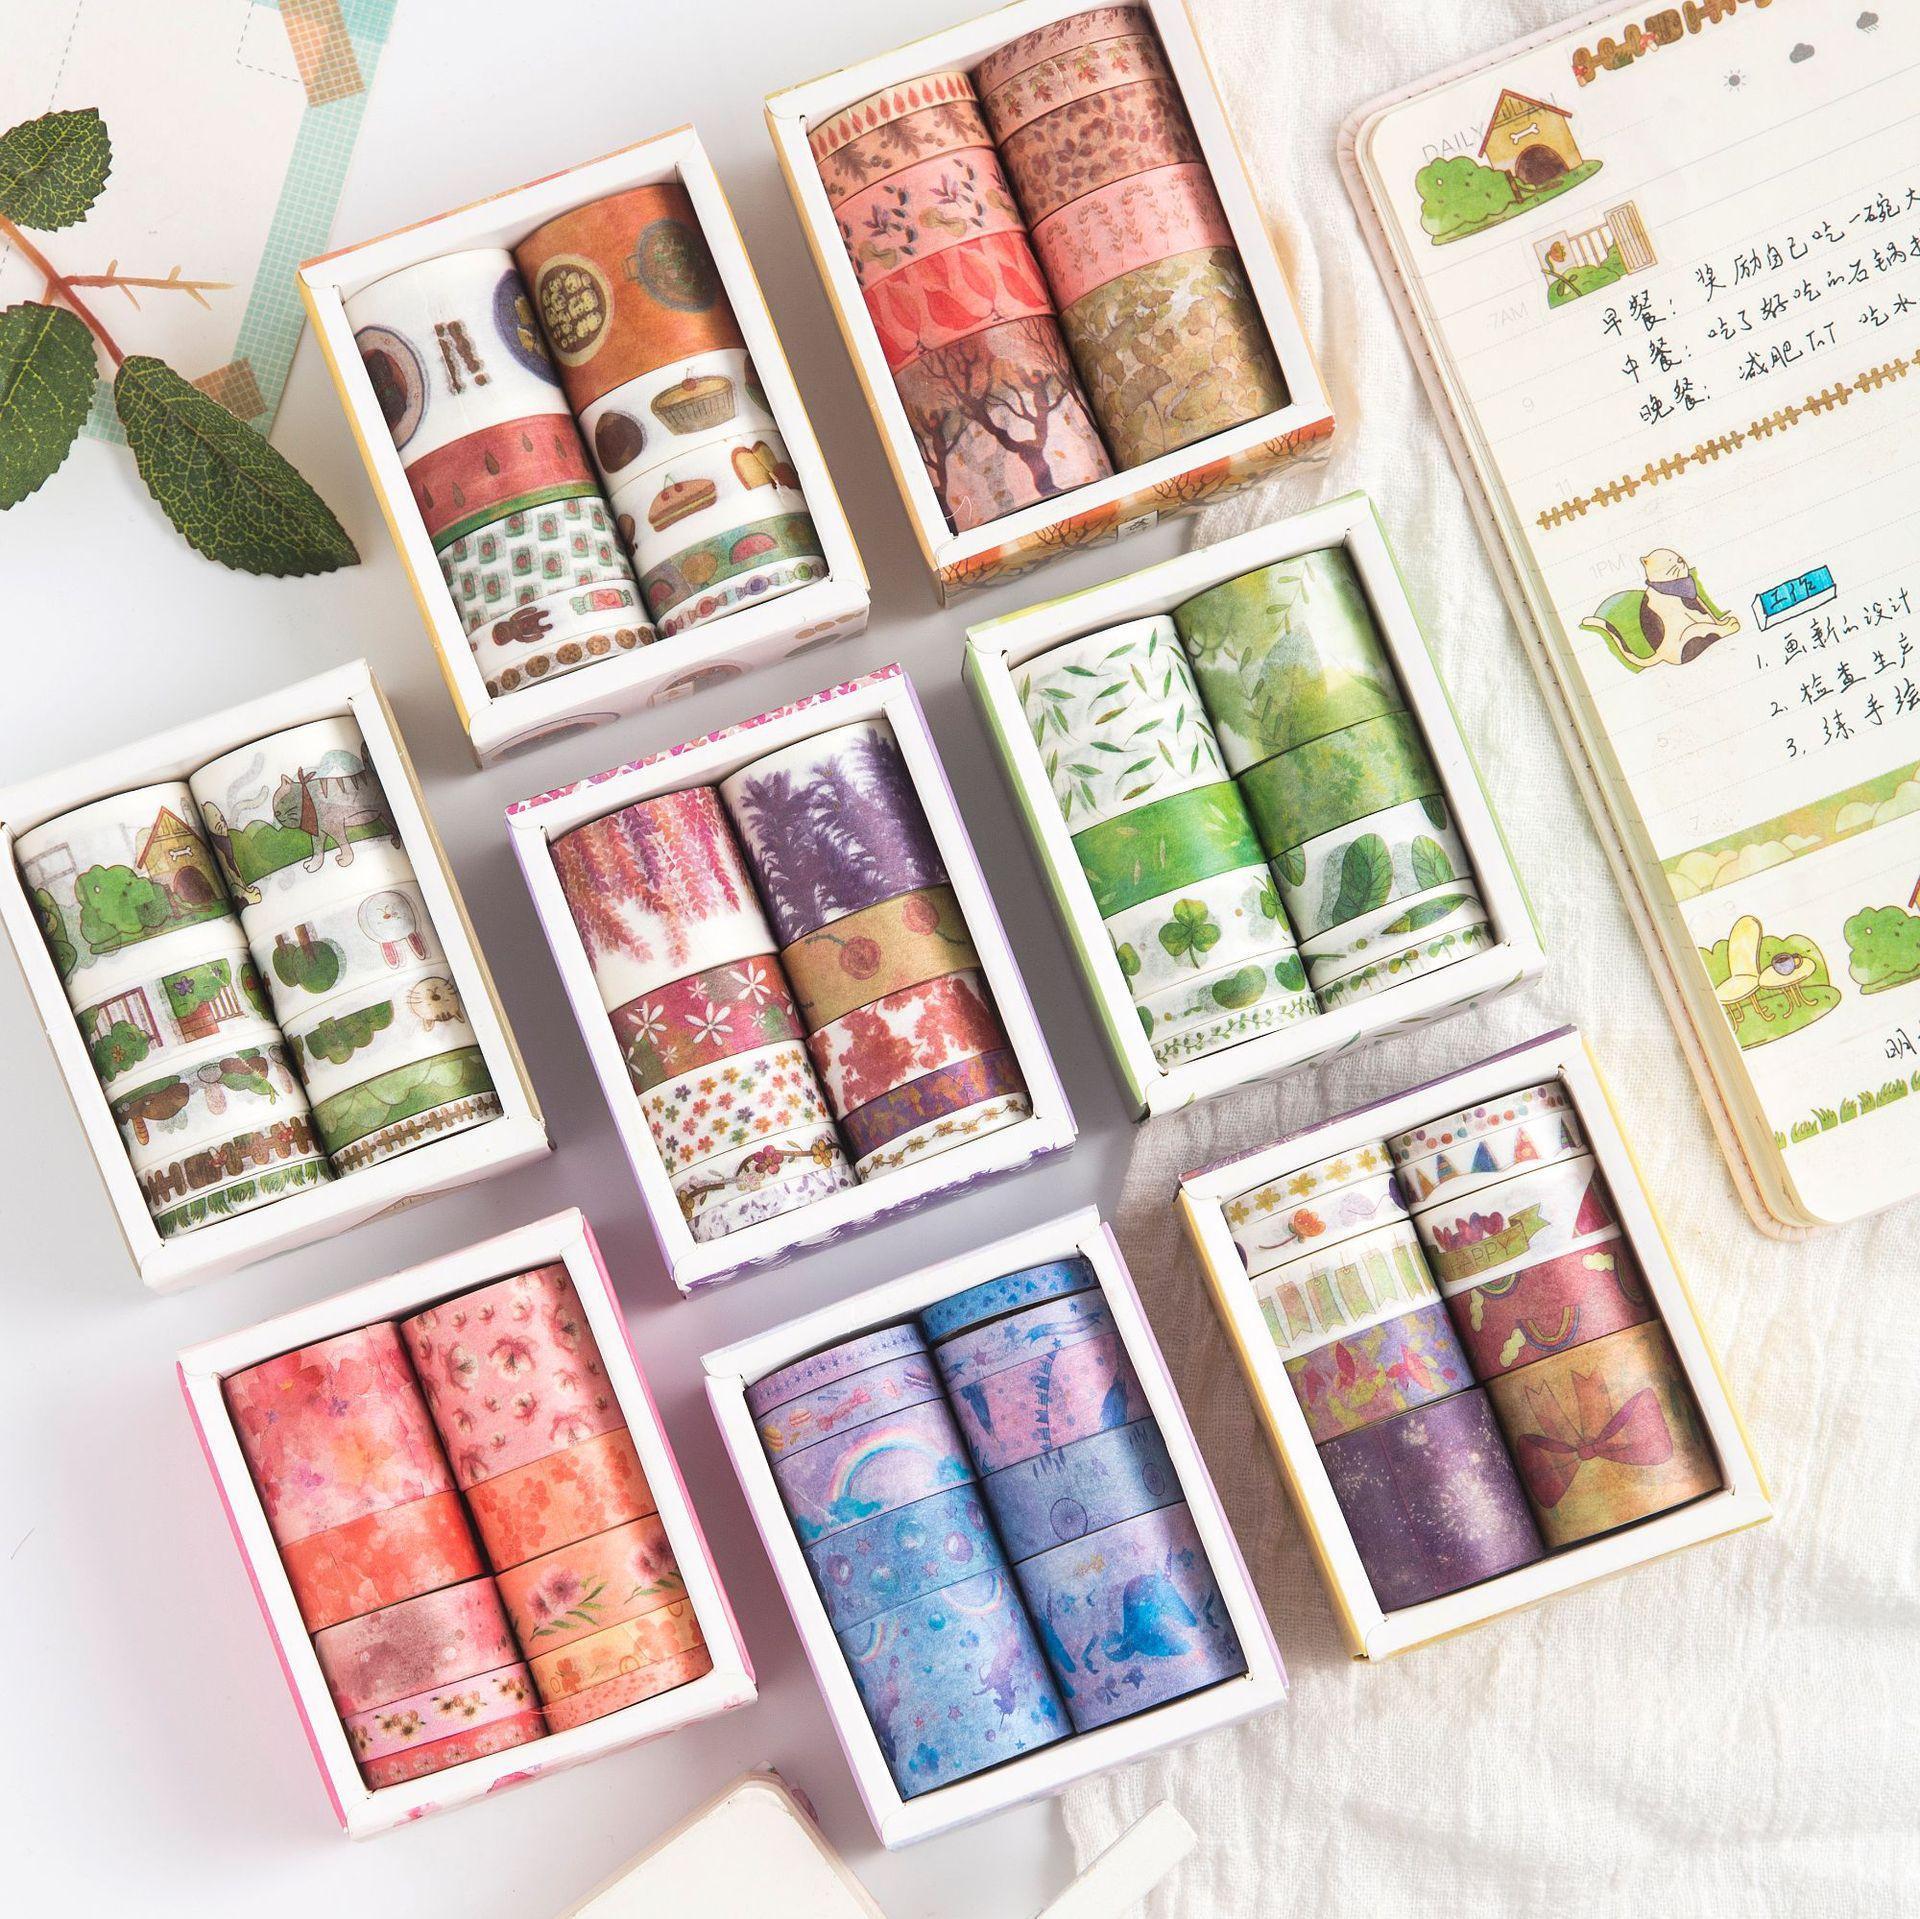 10 pçs/lote Girlish Séries Coração Floral Bonito Conjunto Japonês Washi Papel Masking Tape Papelaria Kawaii Fontes Scrapbooking Adesivo